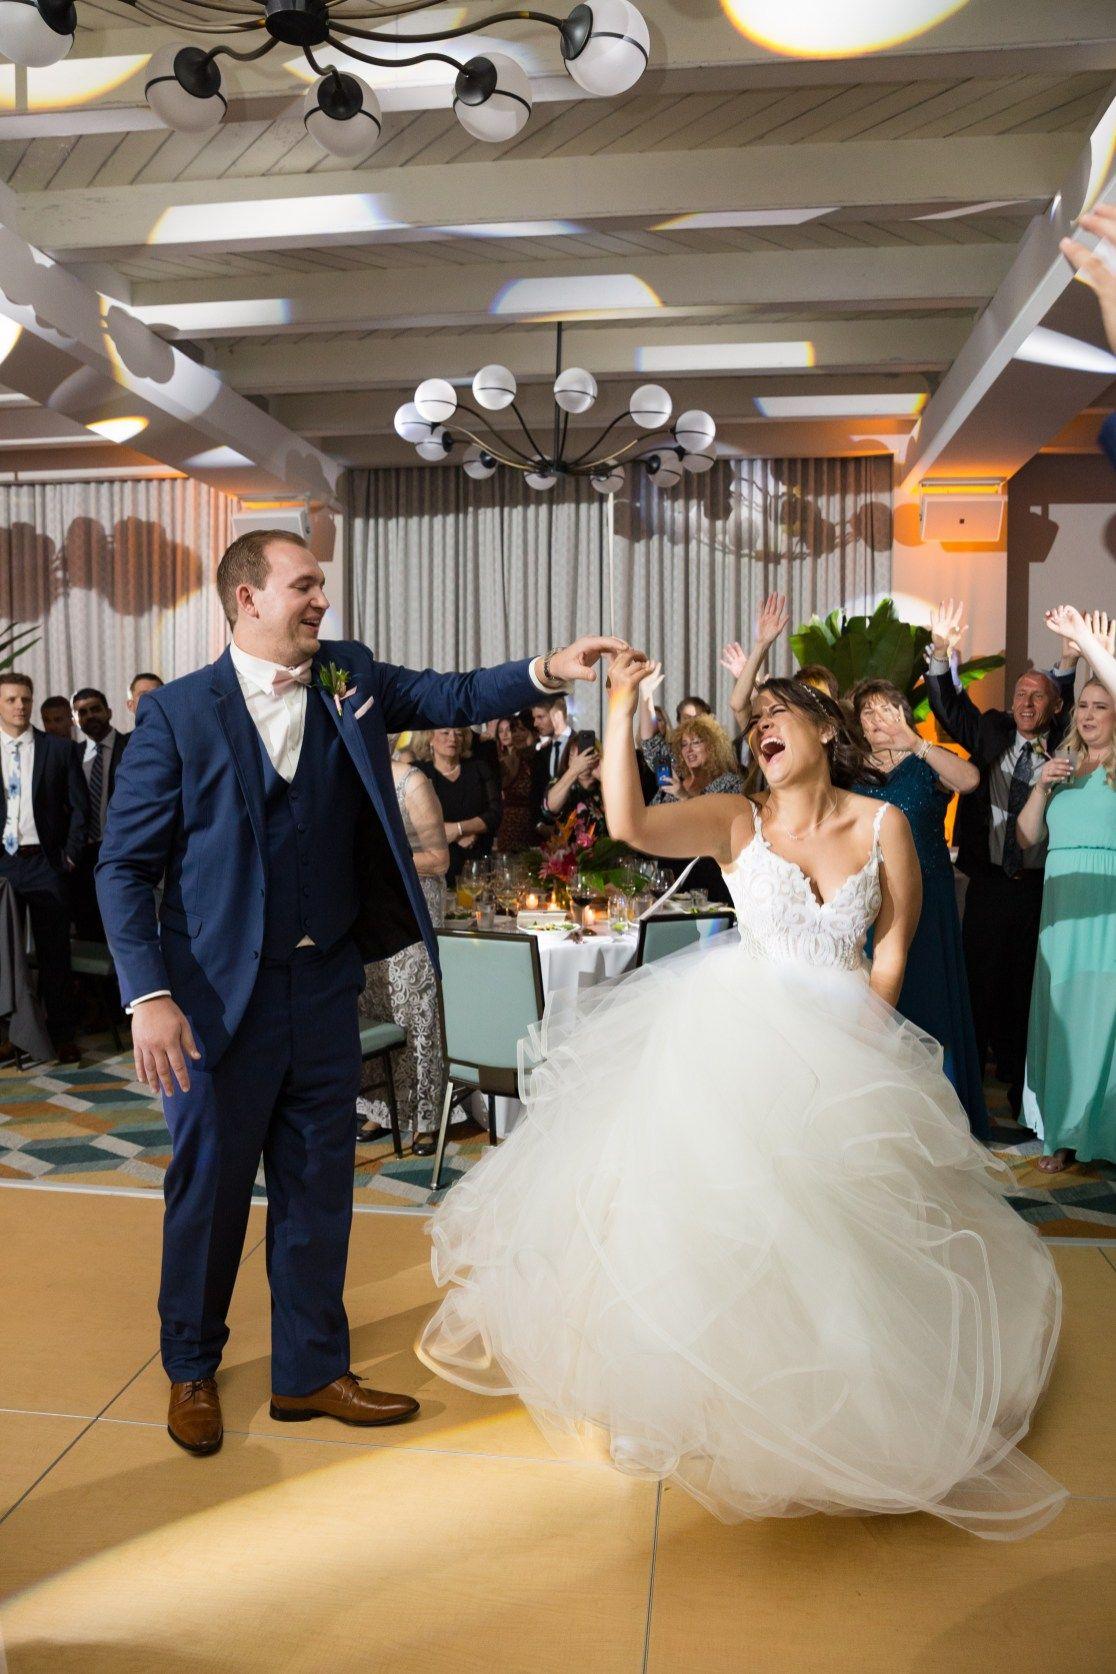 44+ Wedding planner miami beach ideas